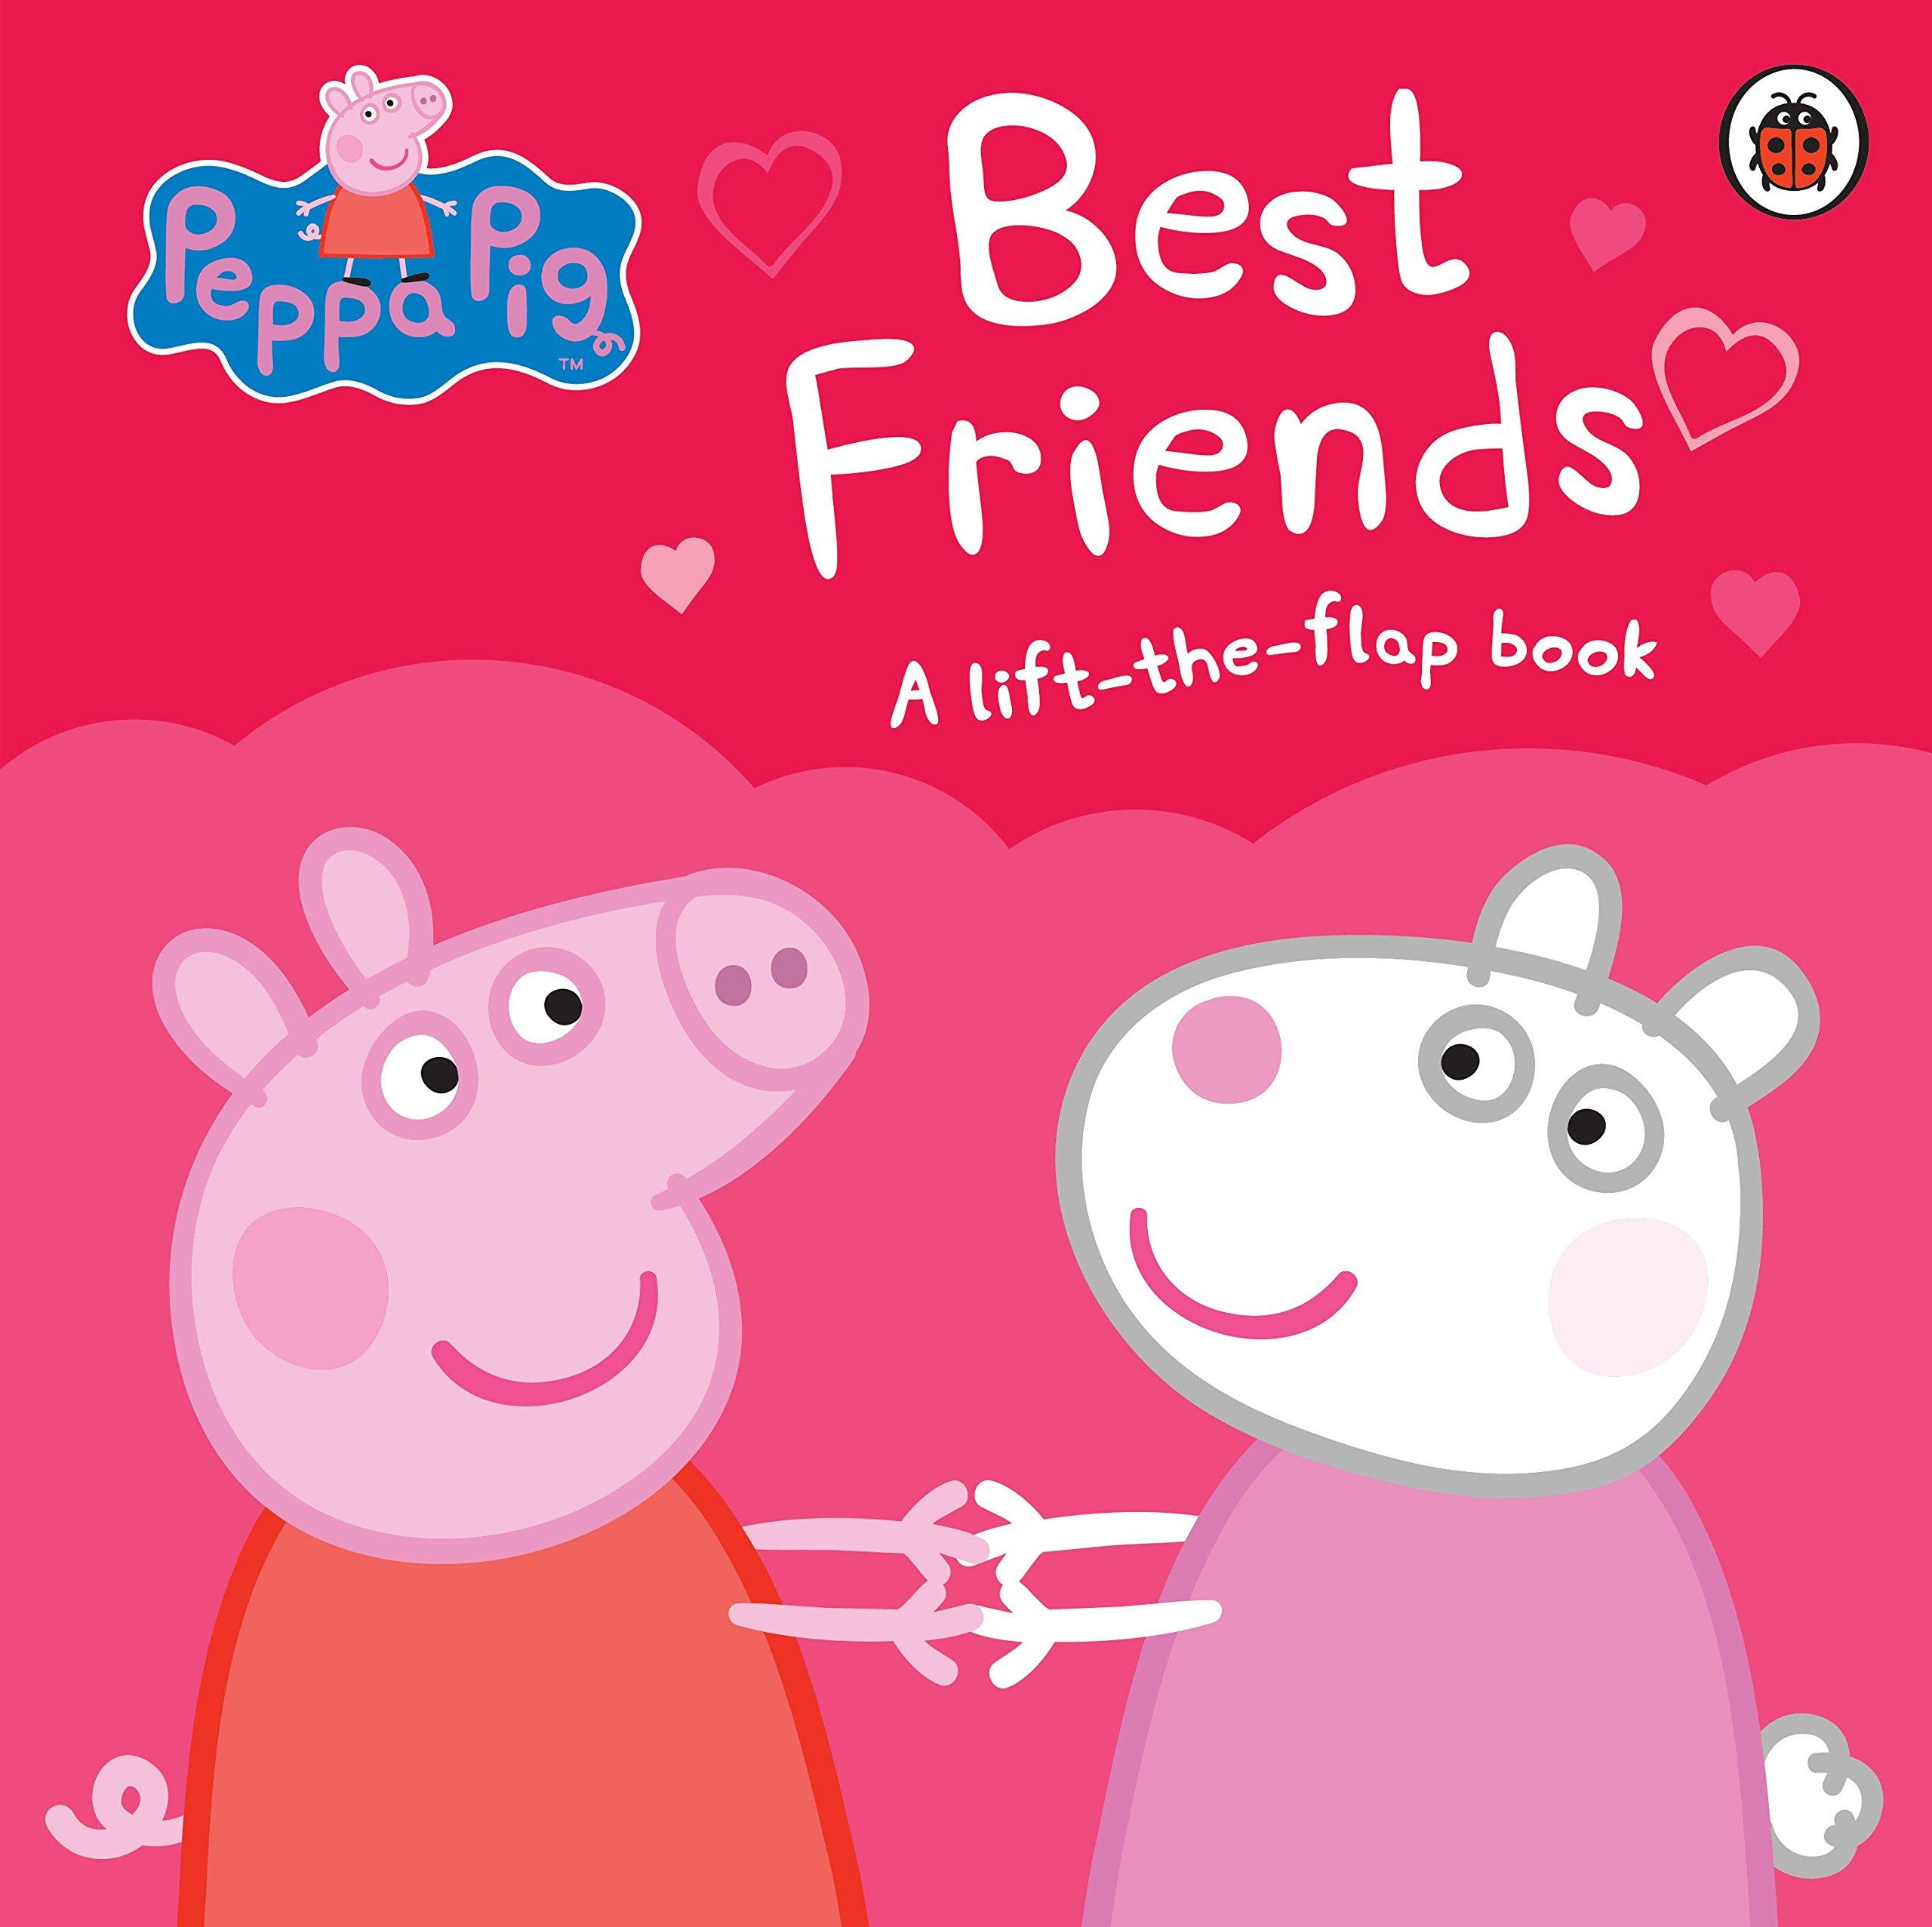 peppa pig best friends amazon co uk ladybird 9780241249239 books